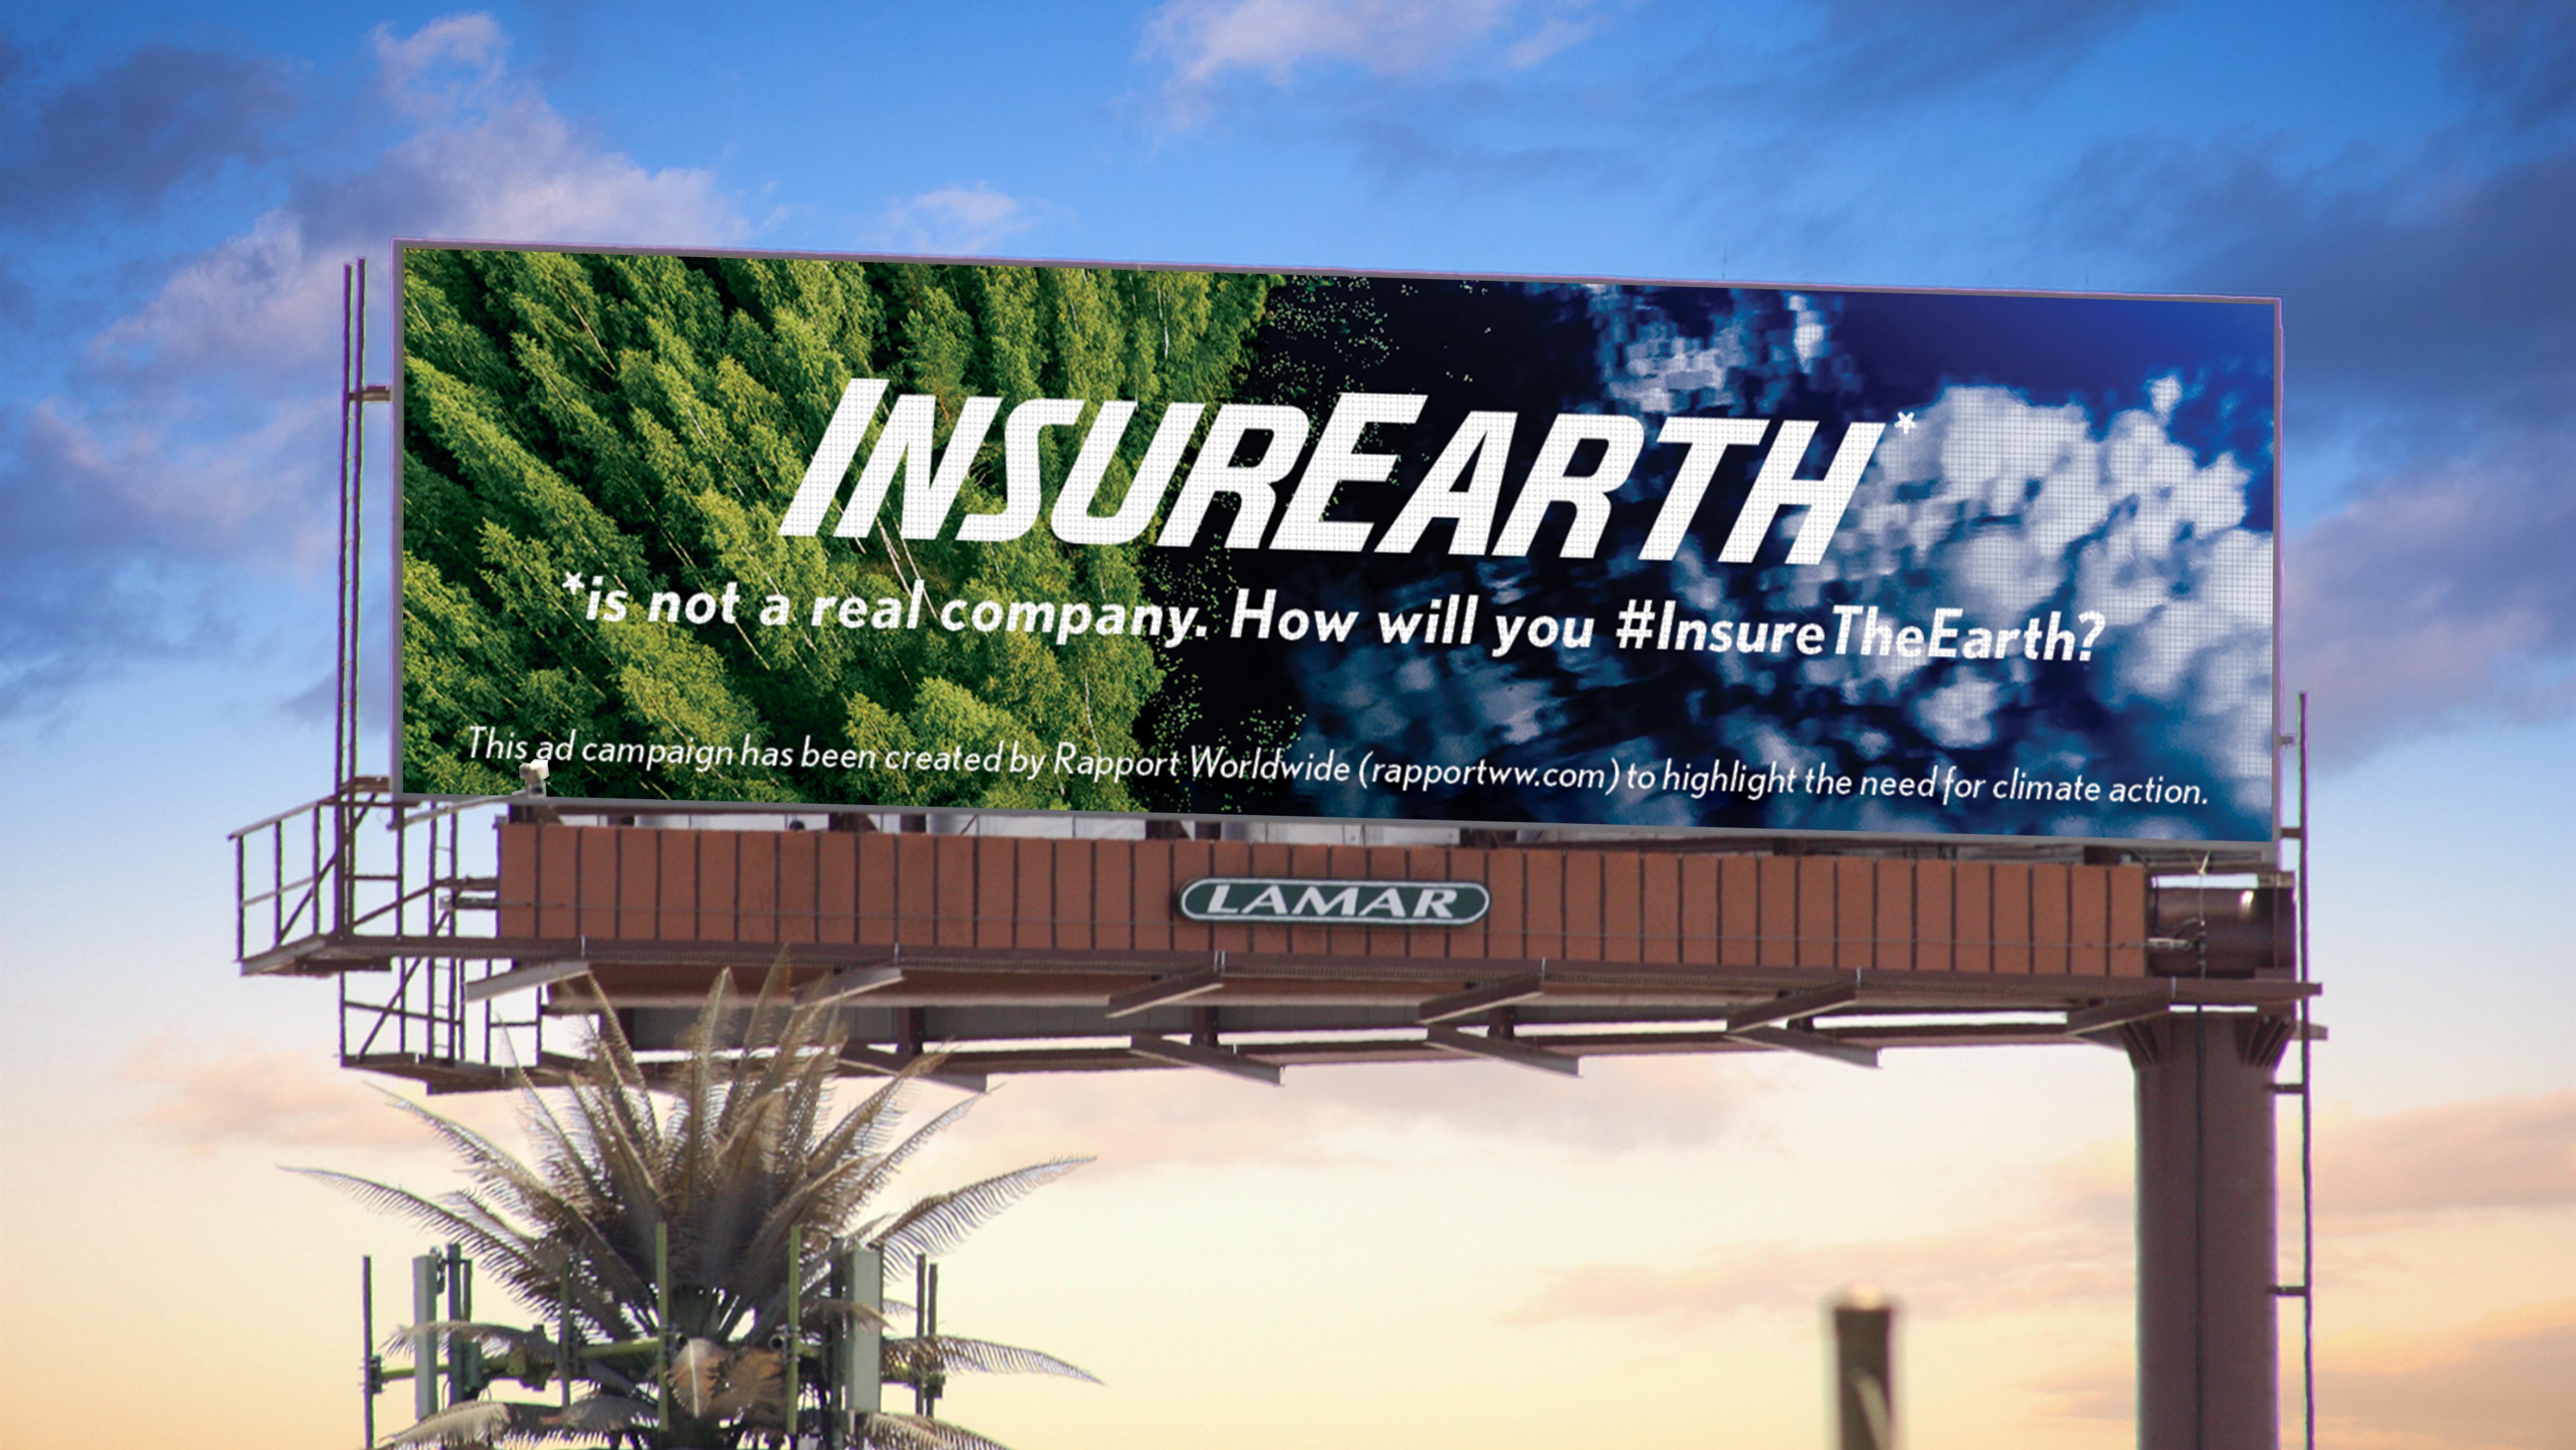 insure earth image